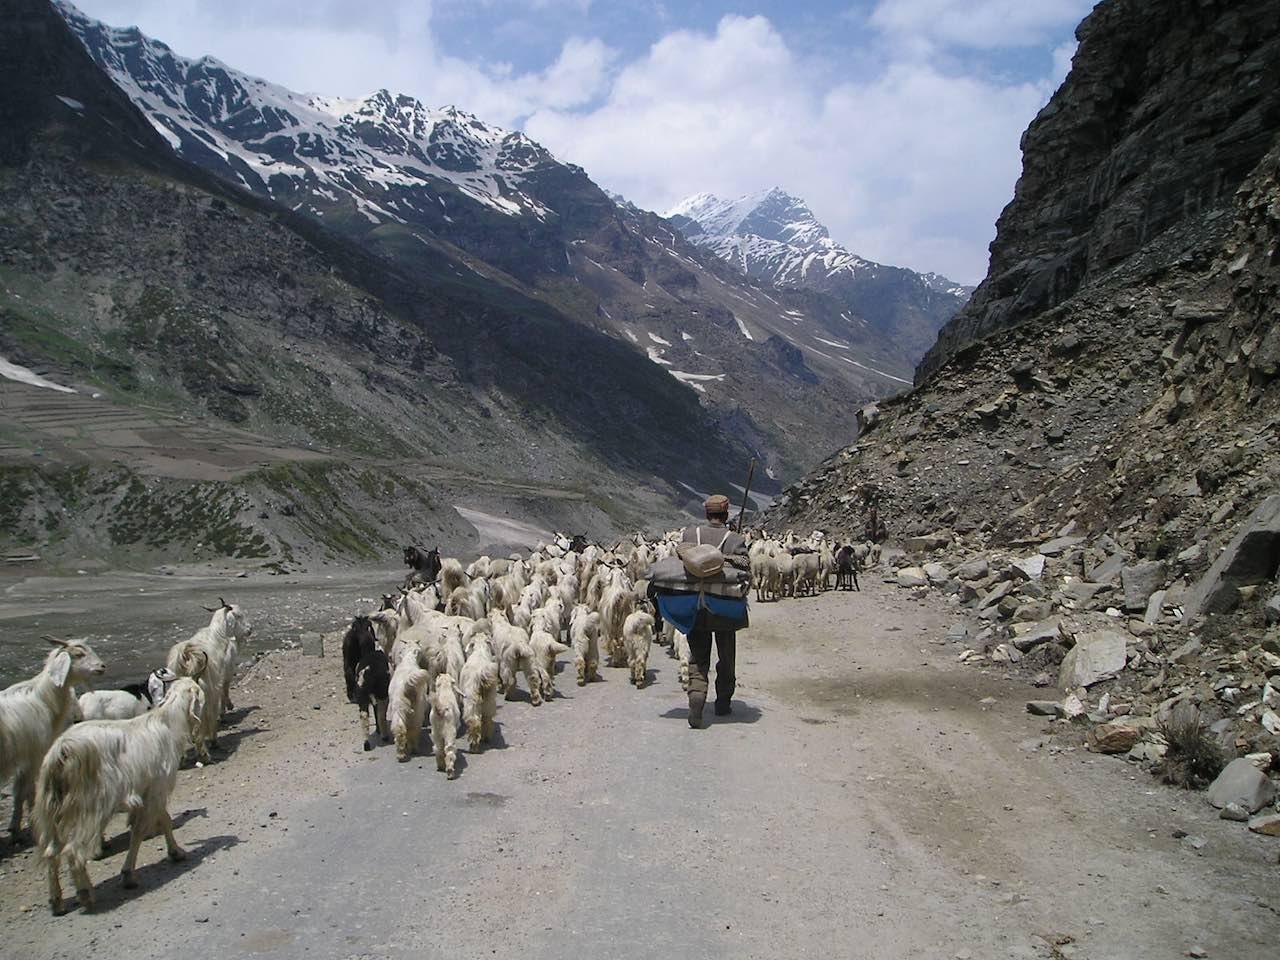 Sheepherder and flock